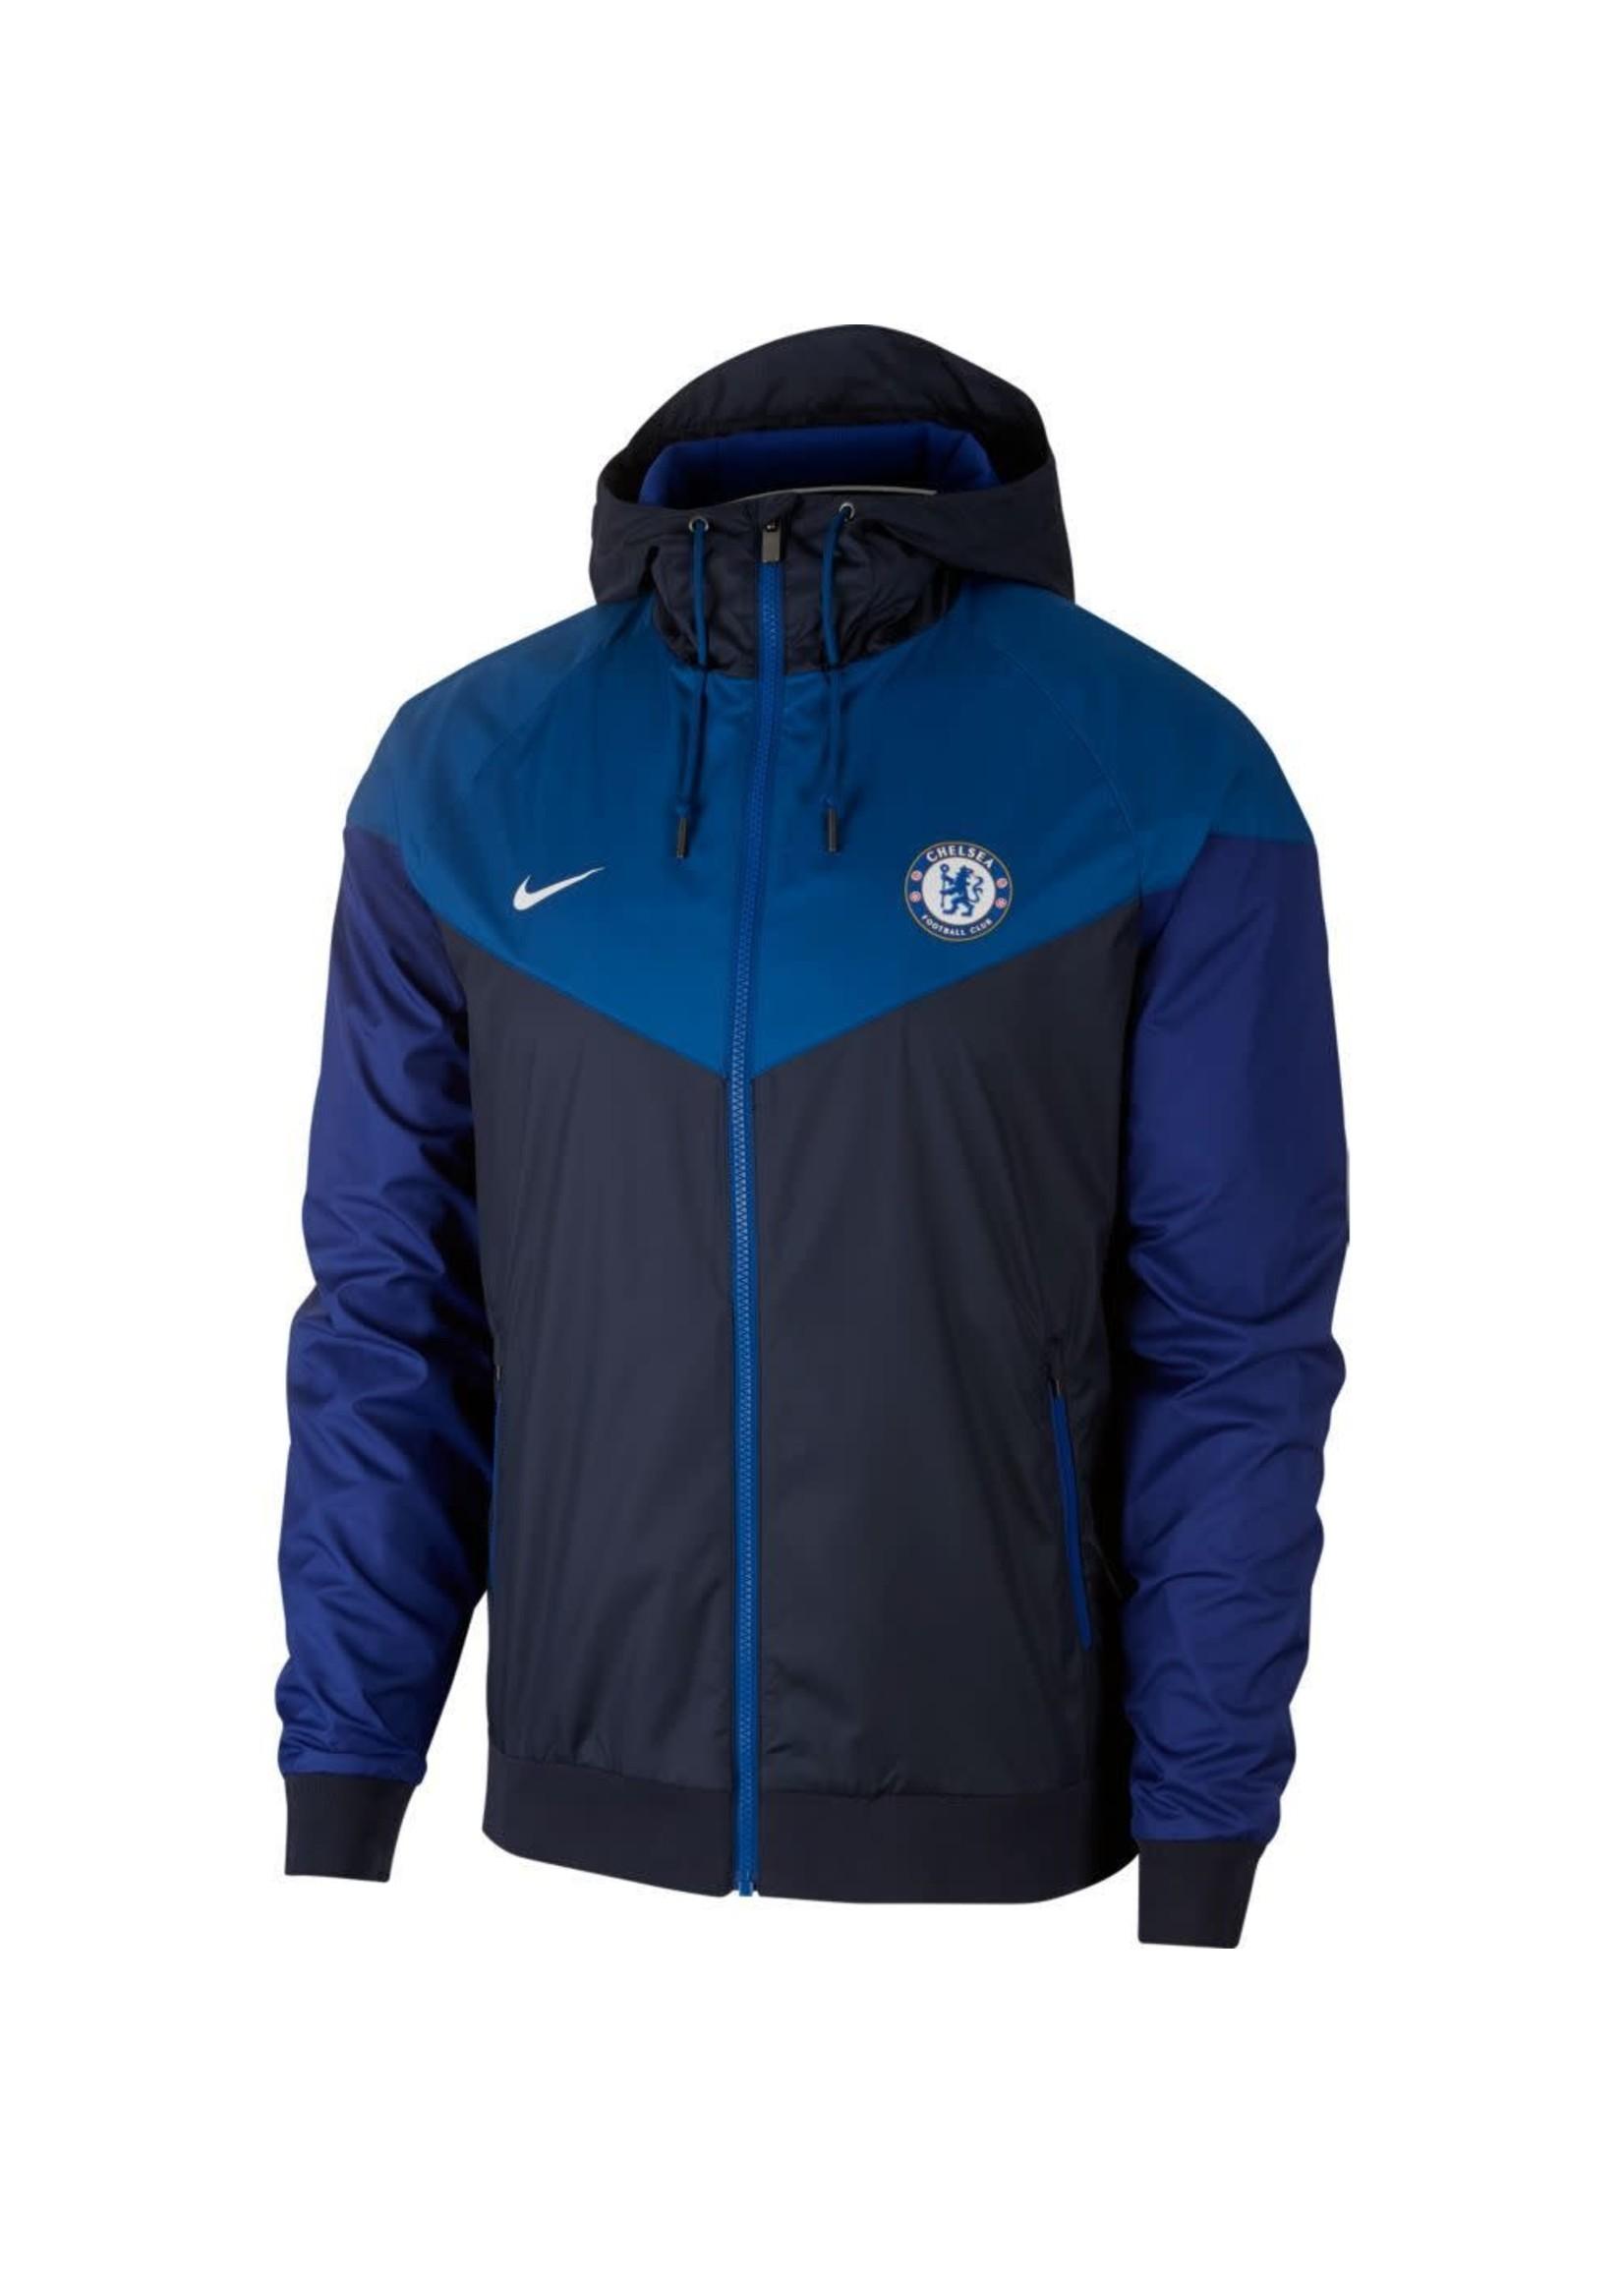 Nike Chelsea Windbreaker Full Zip - Blue/Black